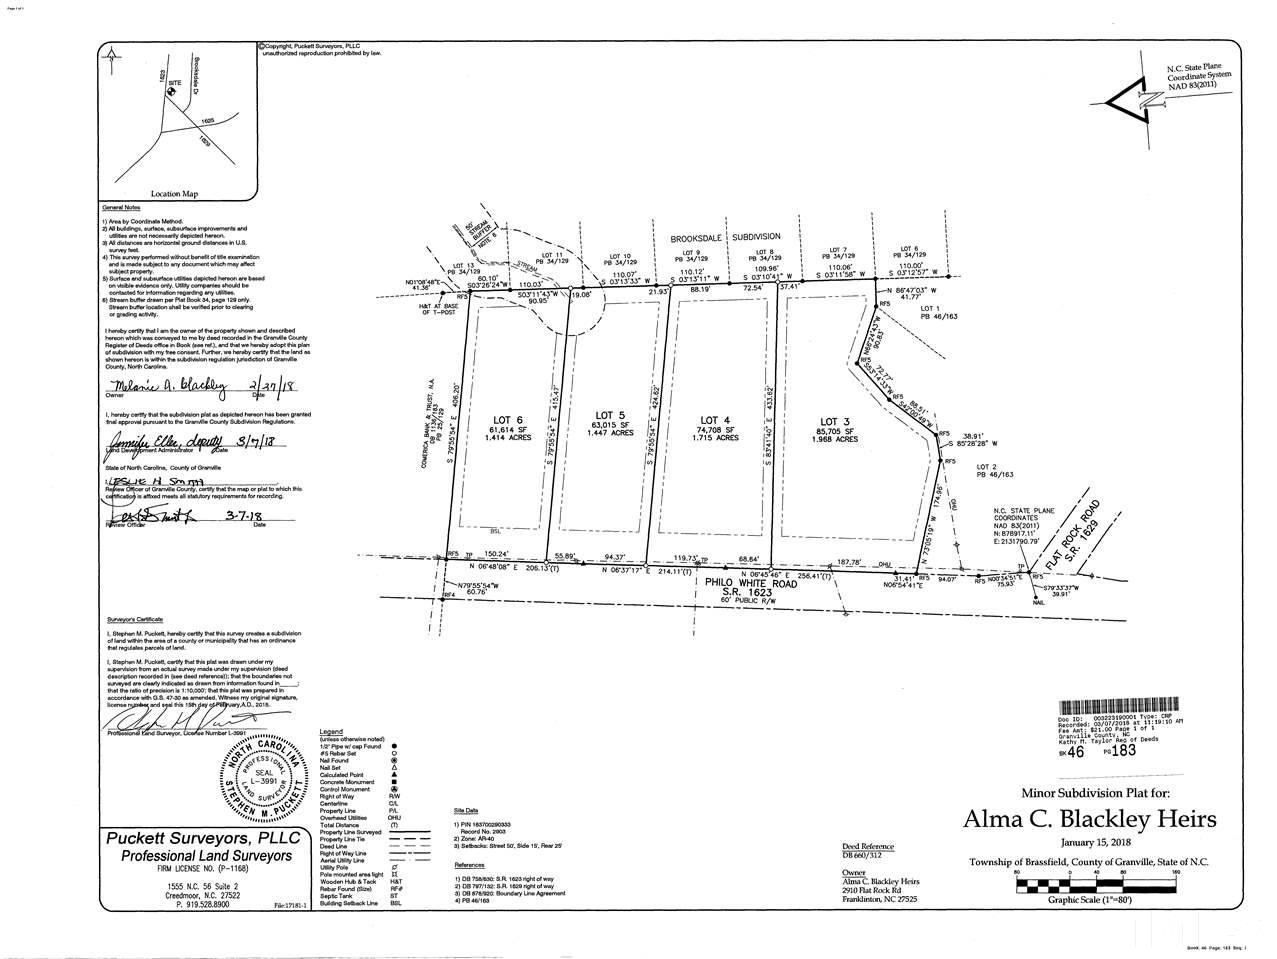 Franklinton Nc Map.4 Philo White Road Franklinton Nc 27525 2178003 Raleigh